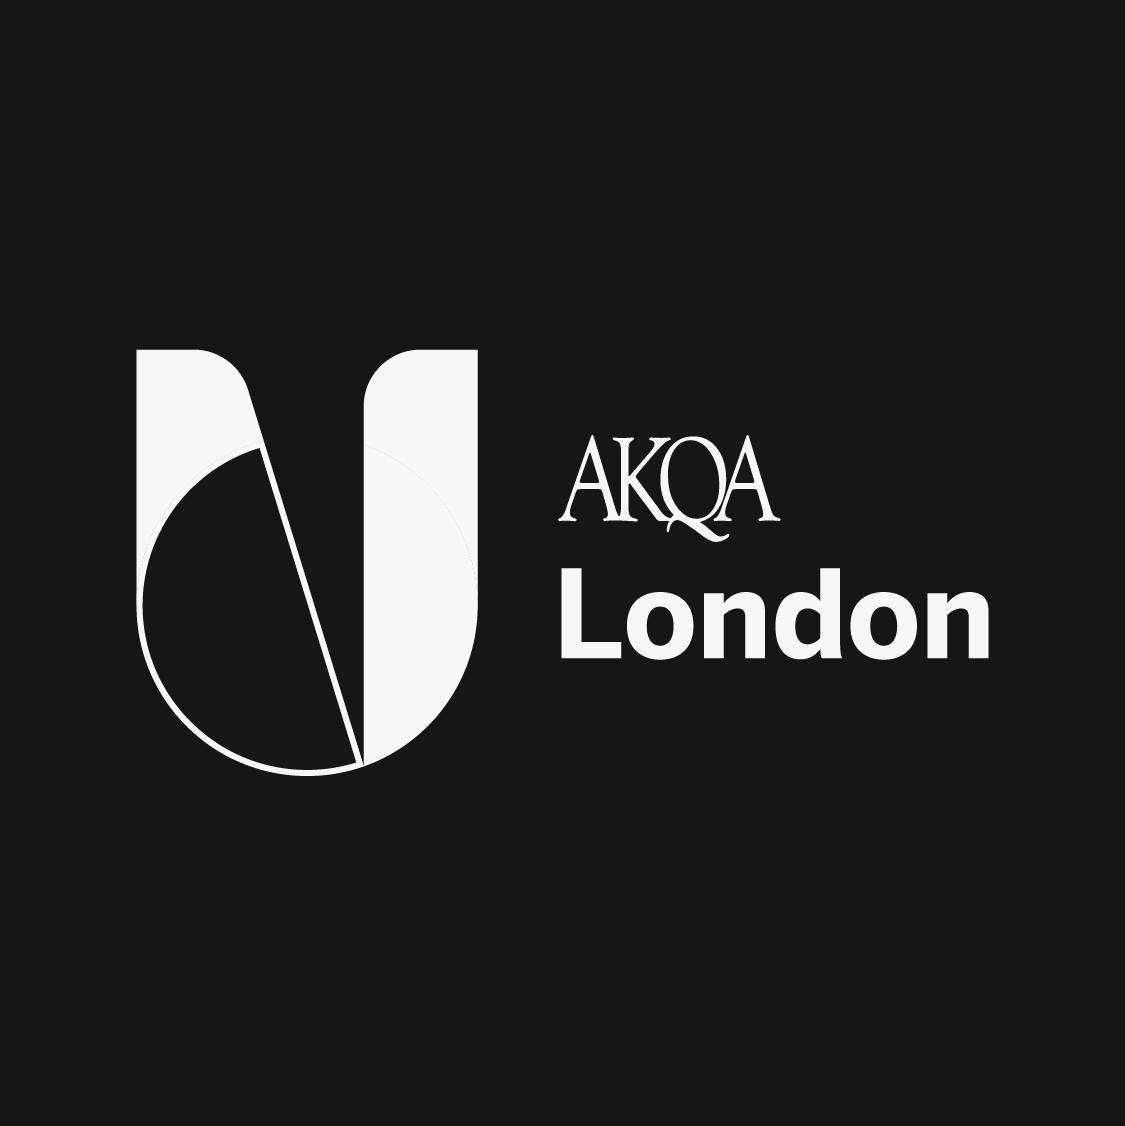 all-logos-2020-09